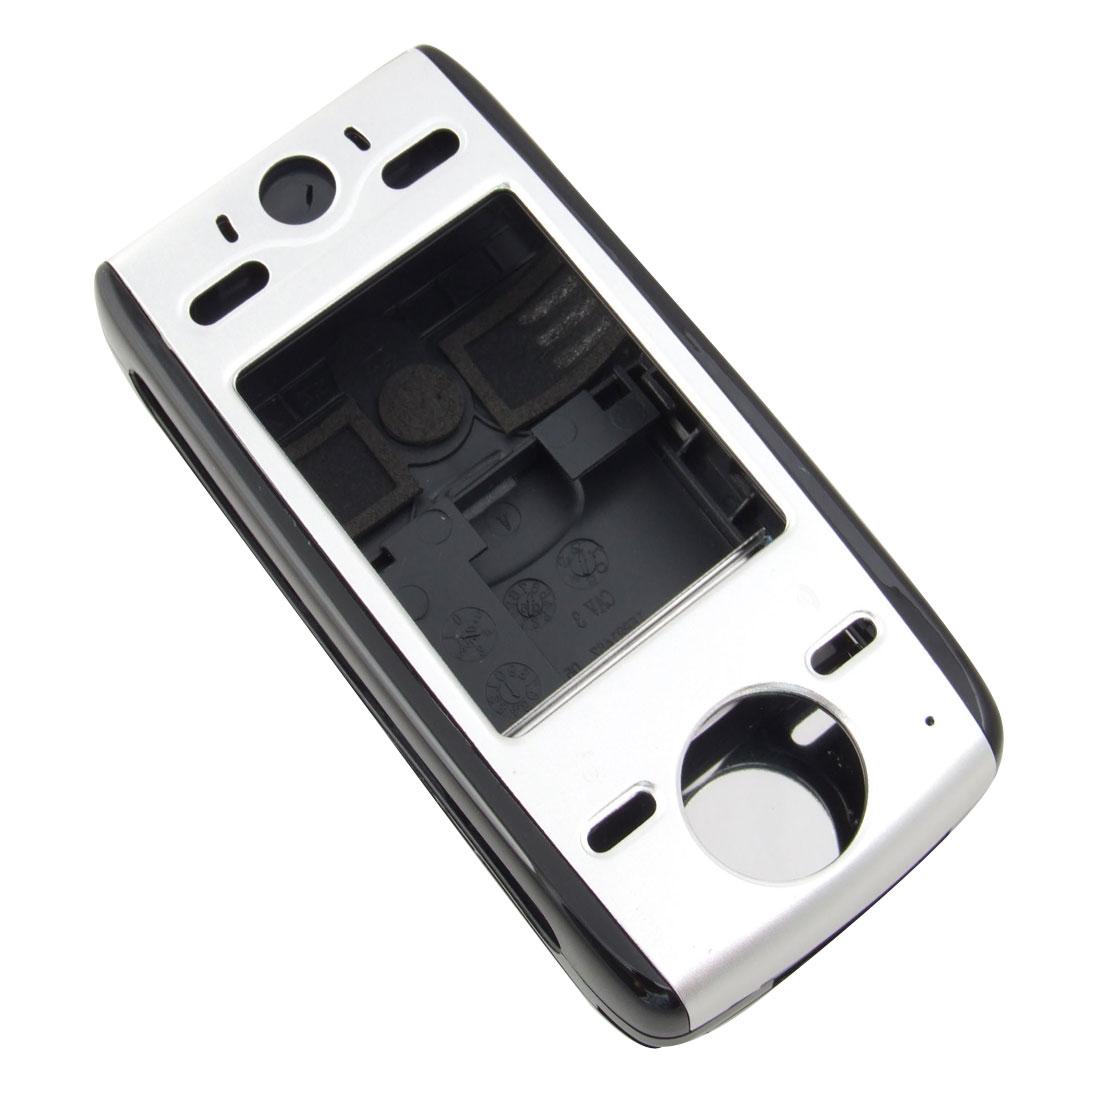 Faceplate Cover Housing For Motorola E680